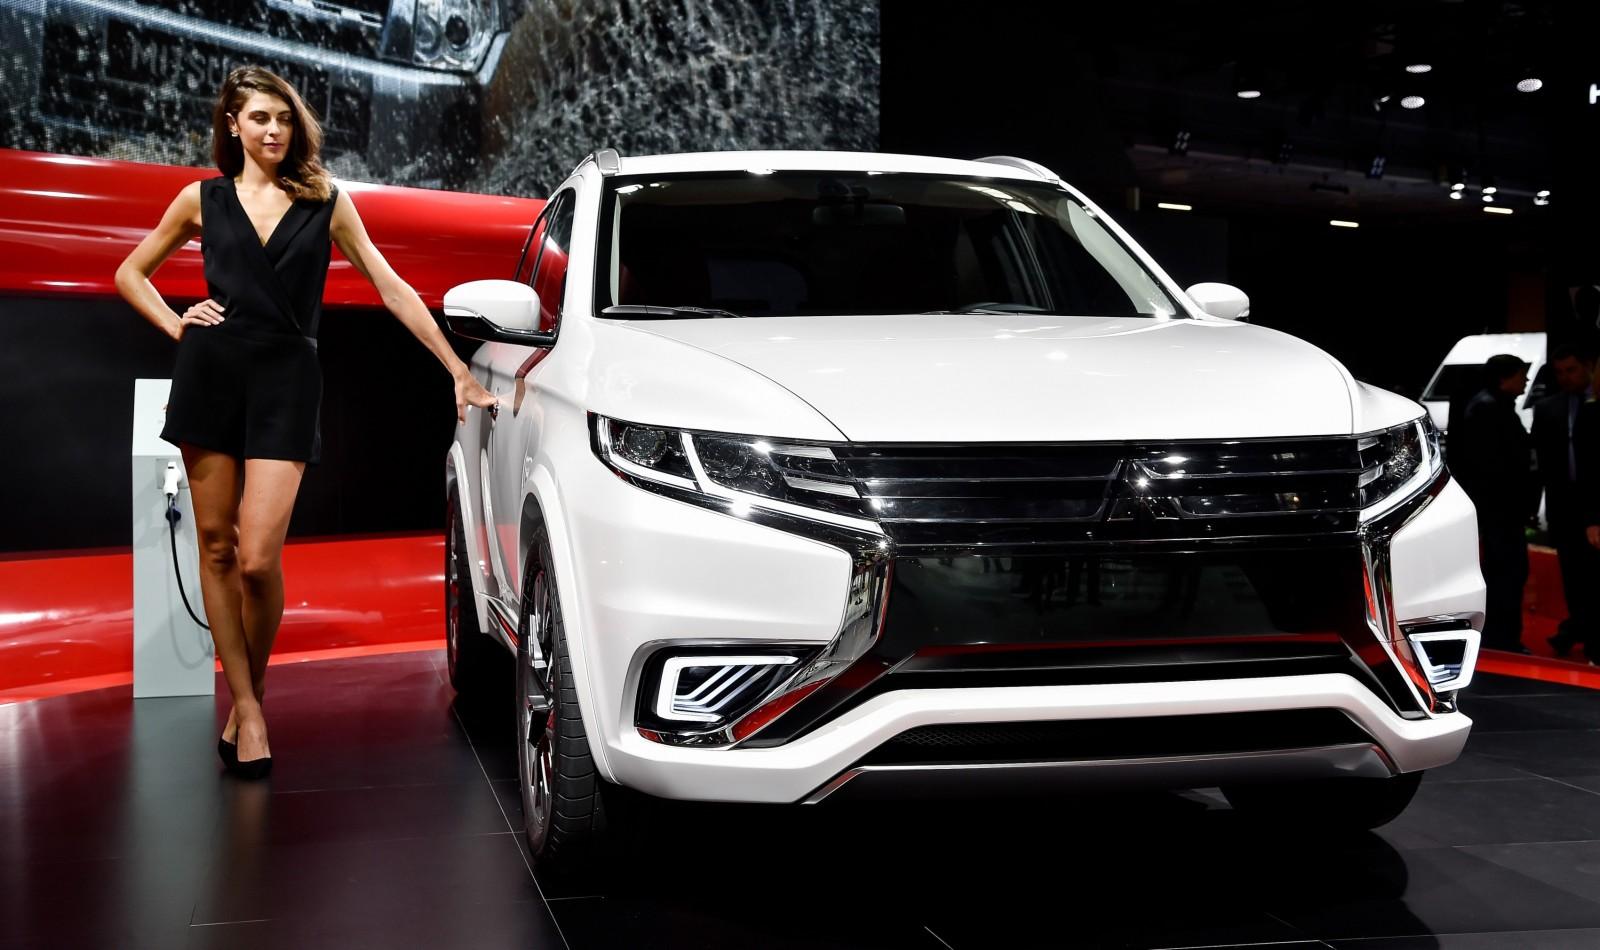 2014 Mitsubishi Outlander PHEV Concept-S 4